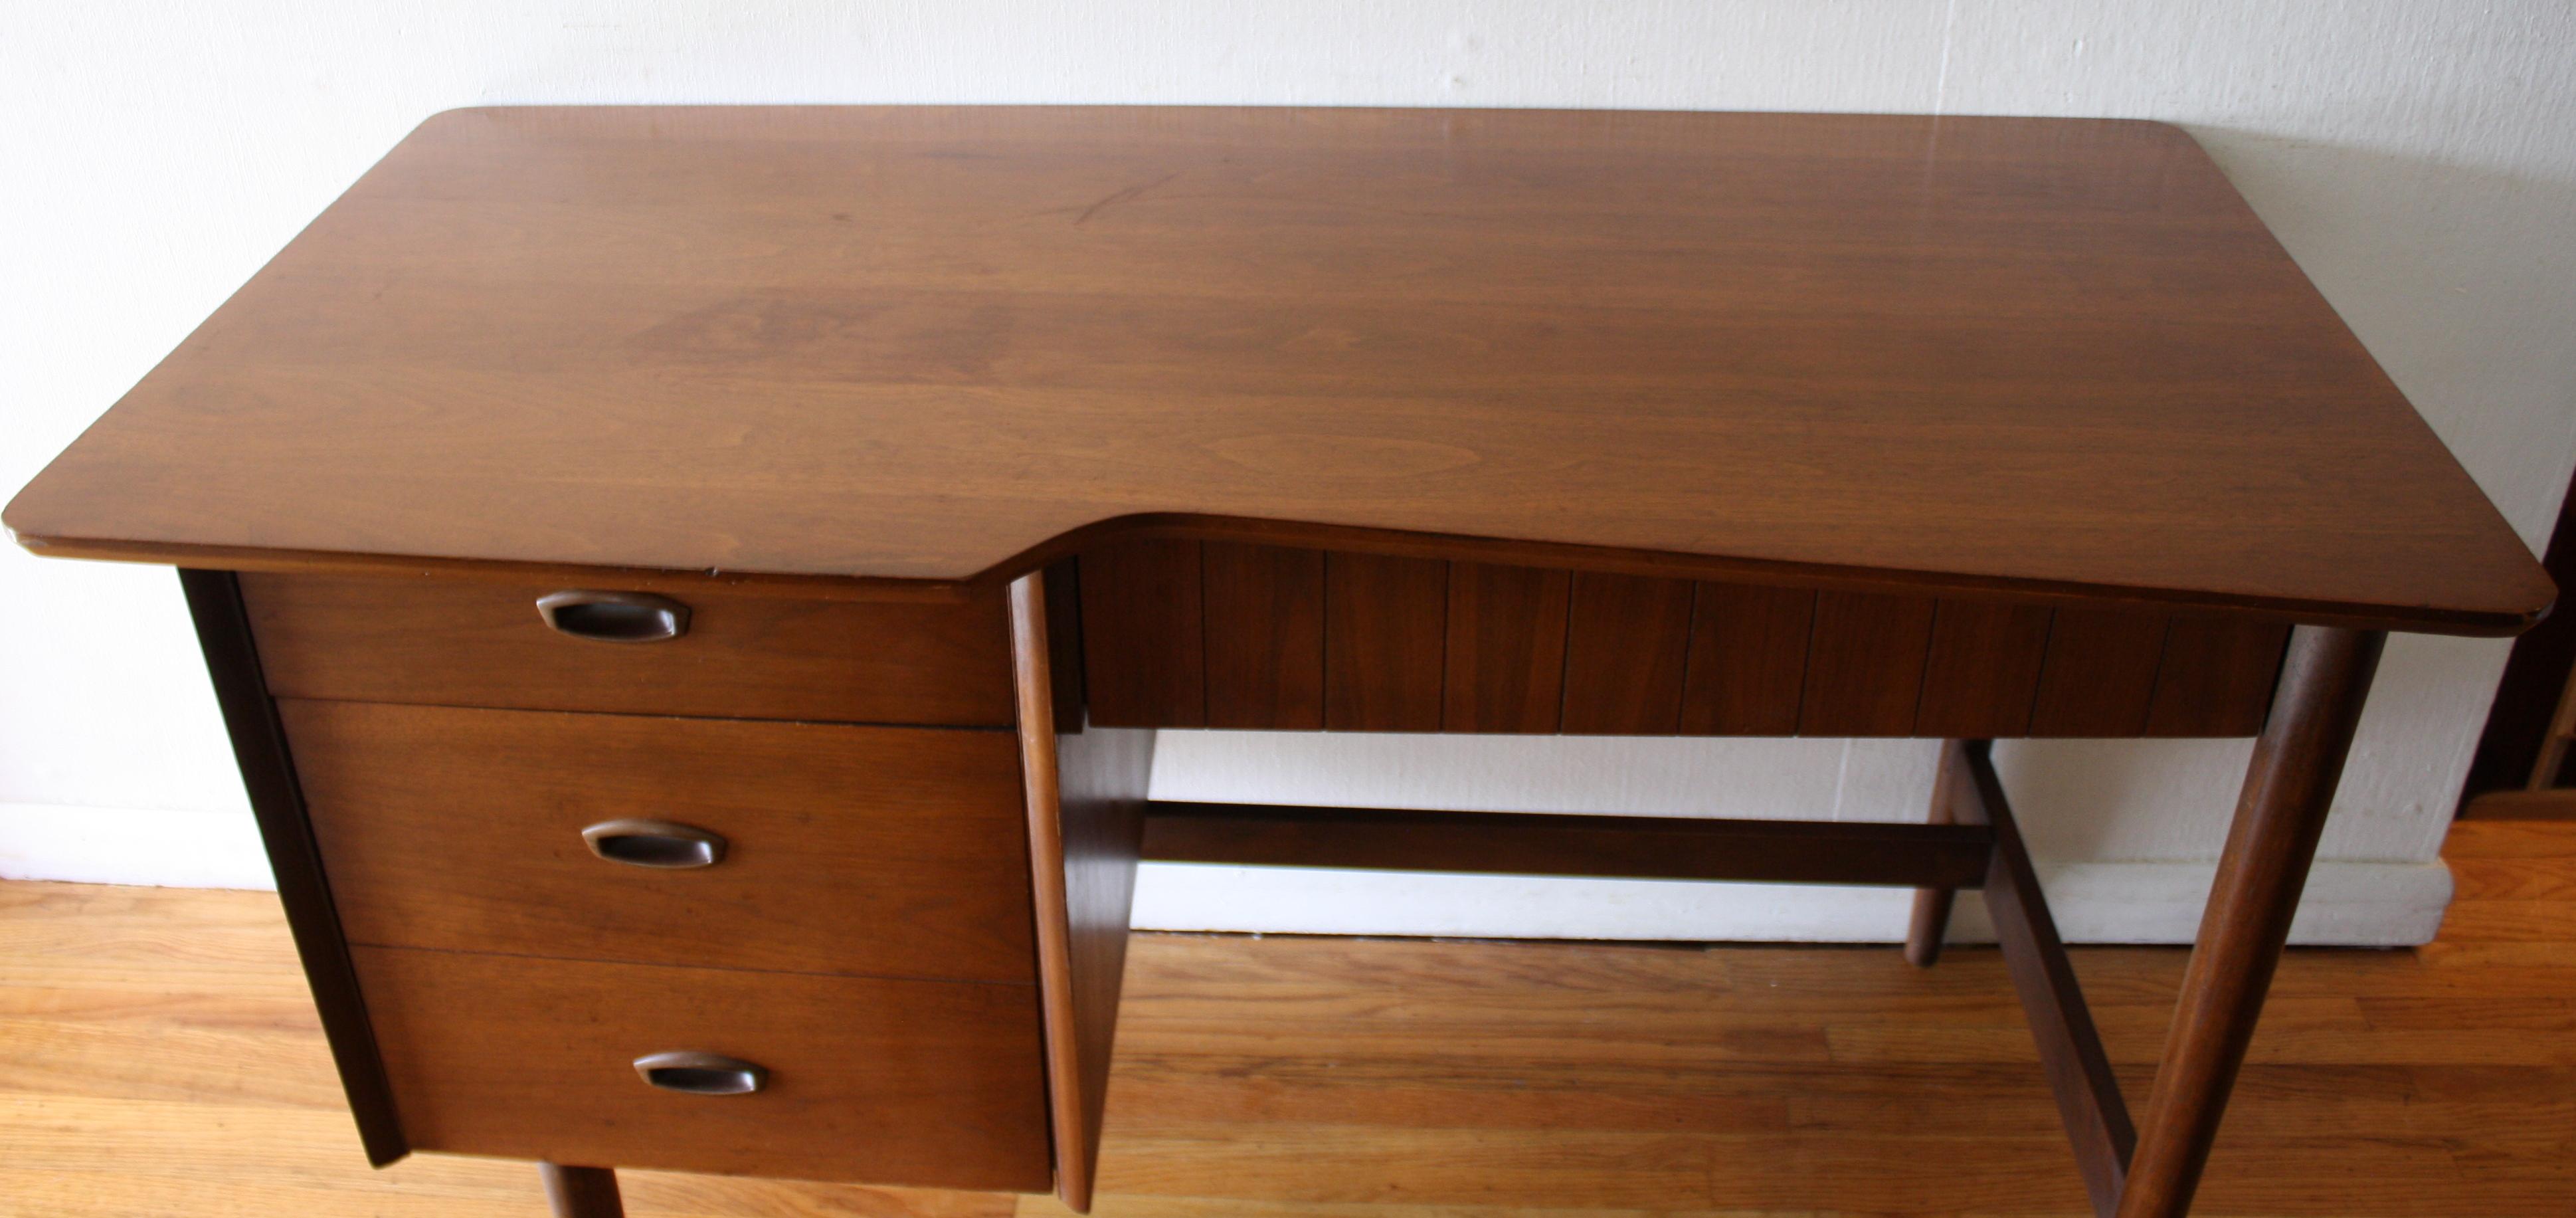 Hooker mainline desk 1 hooker mainline desk 2